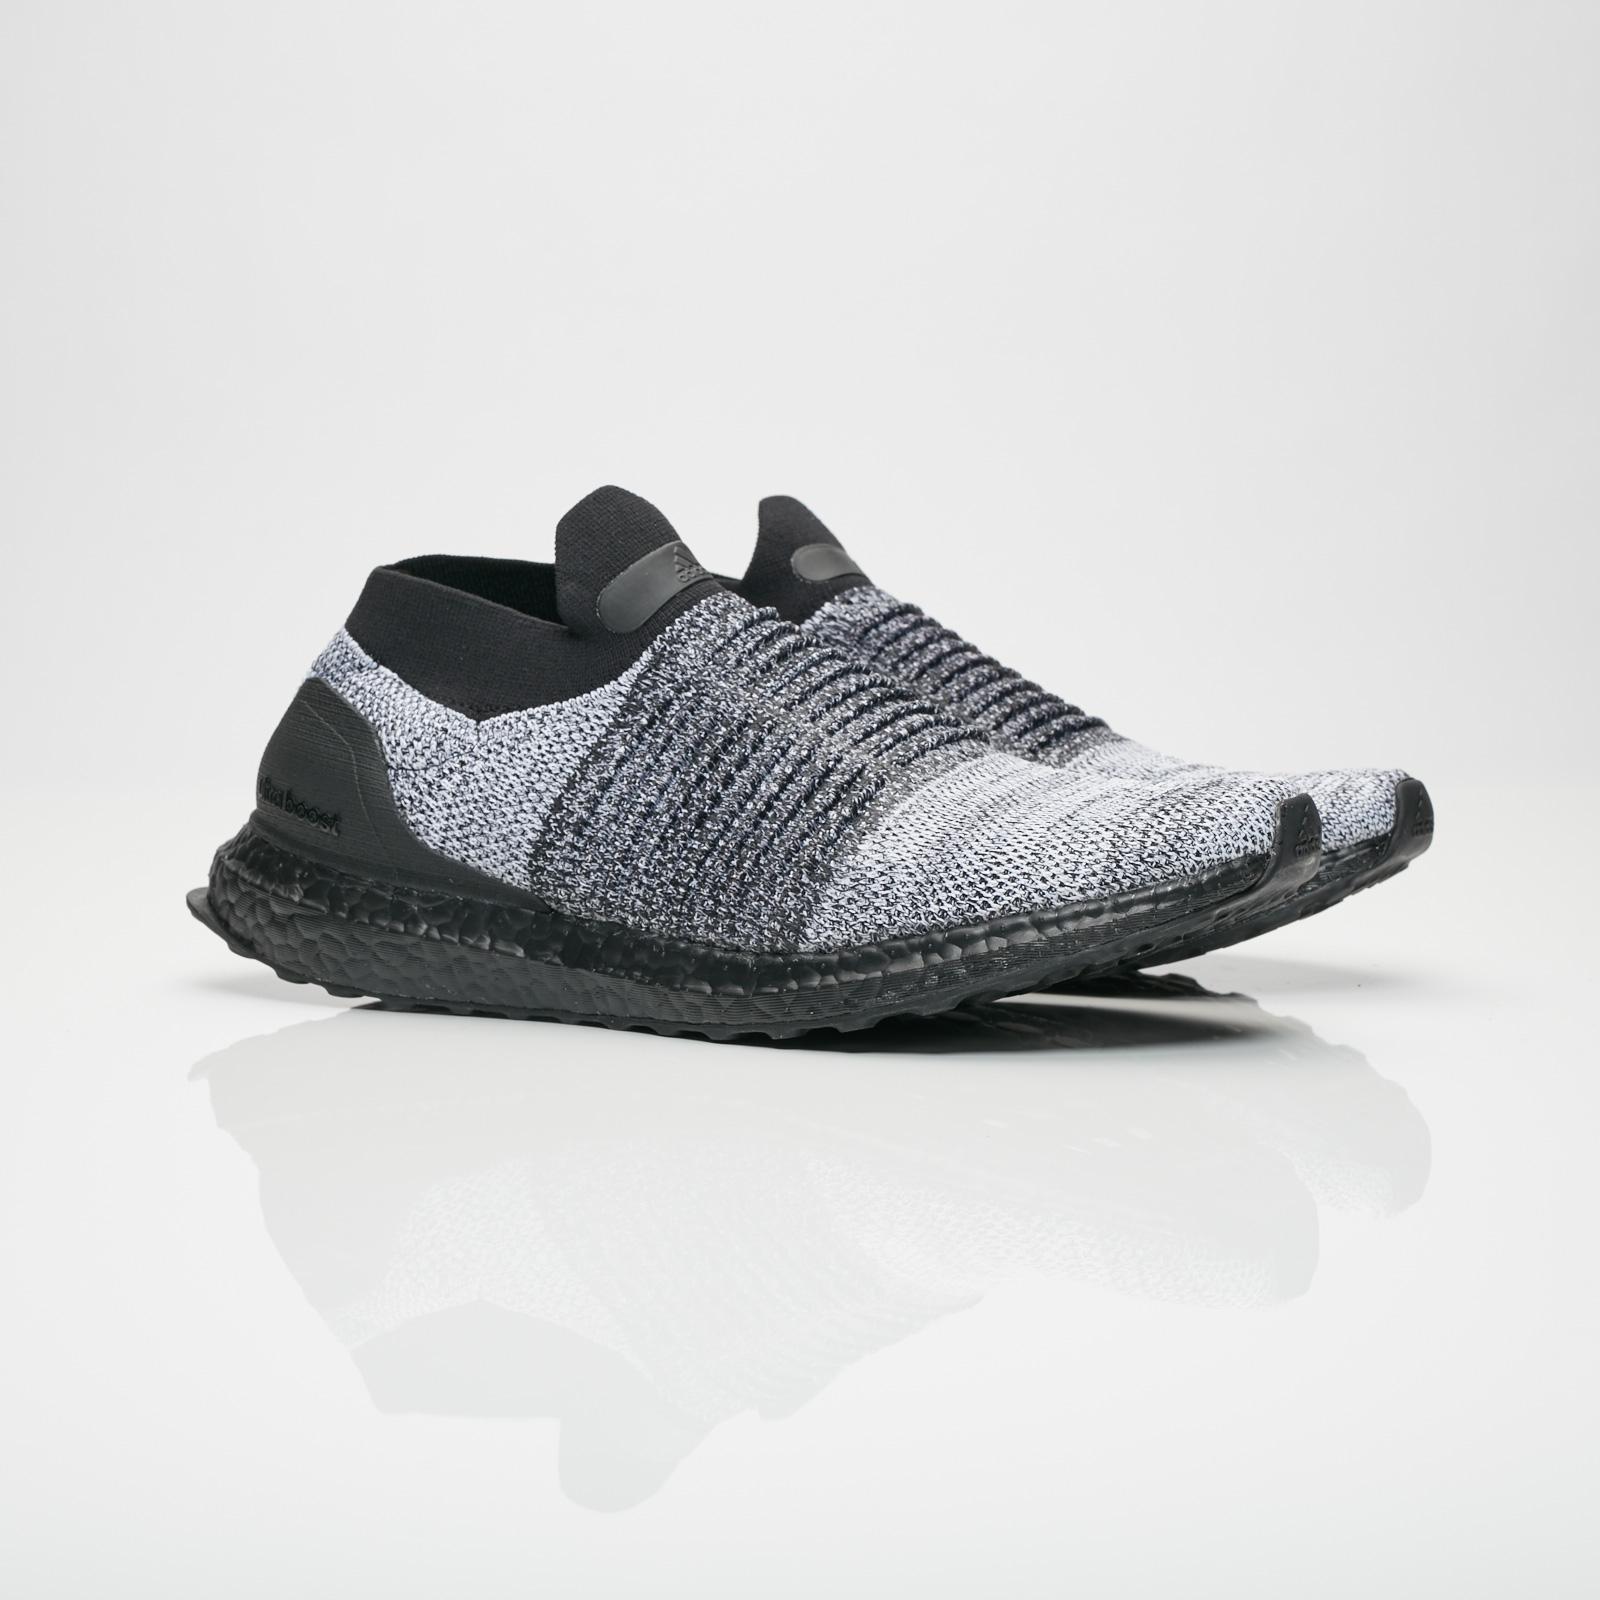 003b8335a05 adidas UltraBOOST Laceless - Bb6137 - Sneakersnstuff